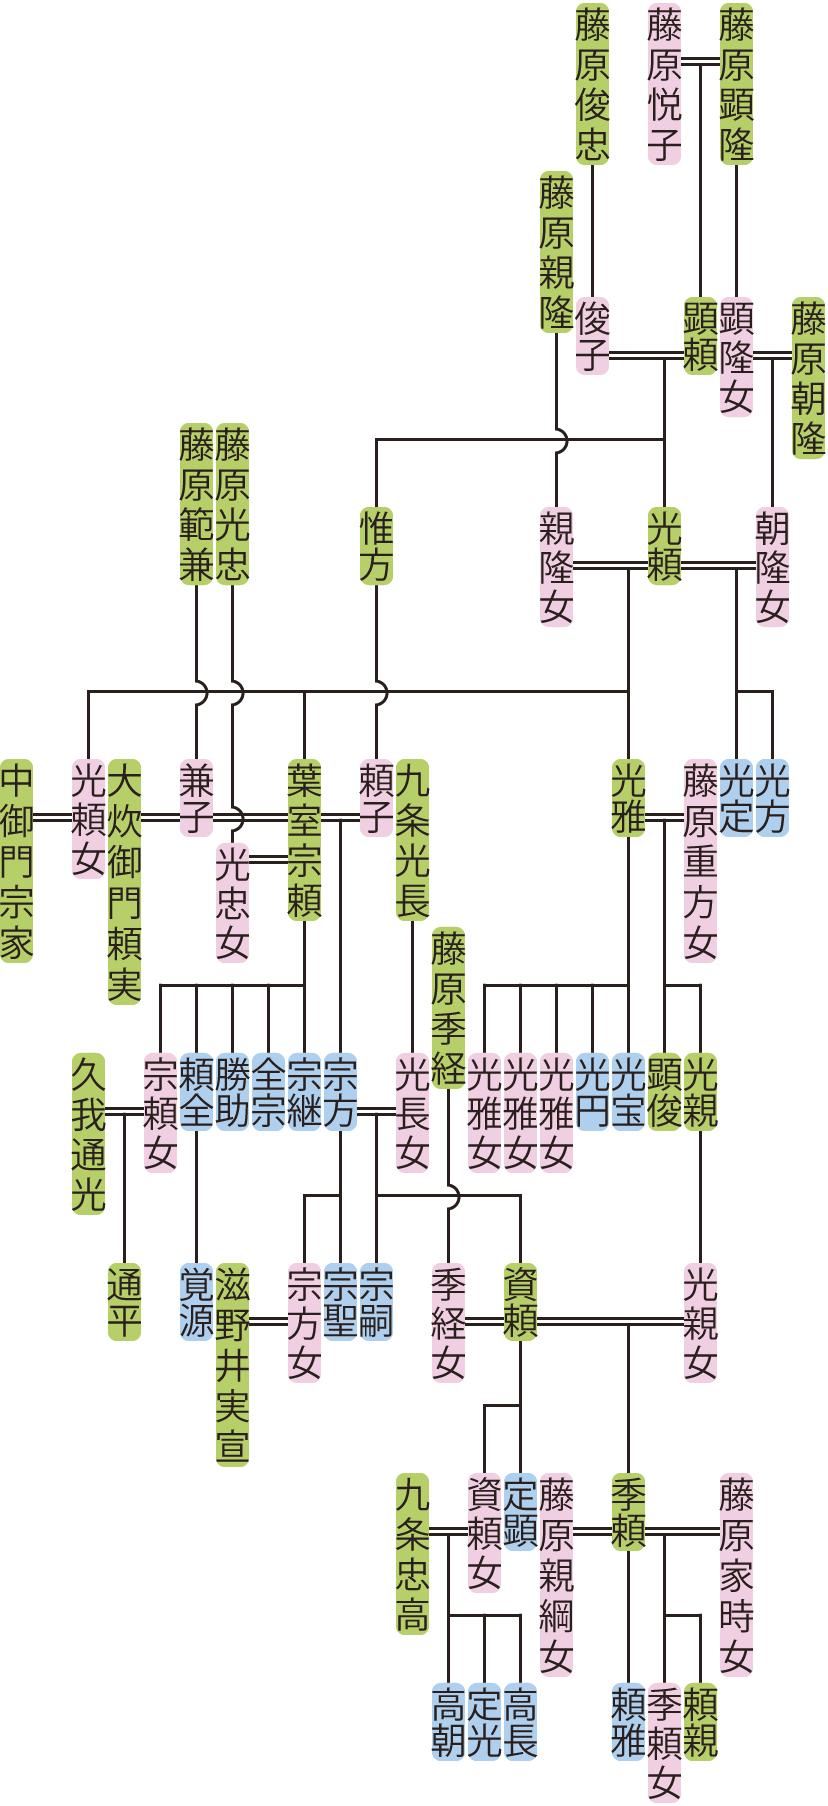 藤原光頼~葉室資頼の系図